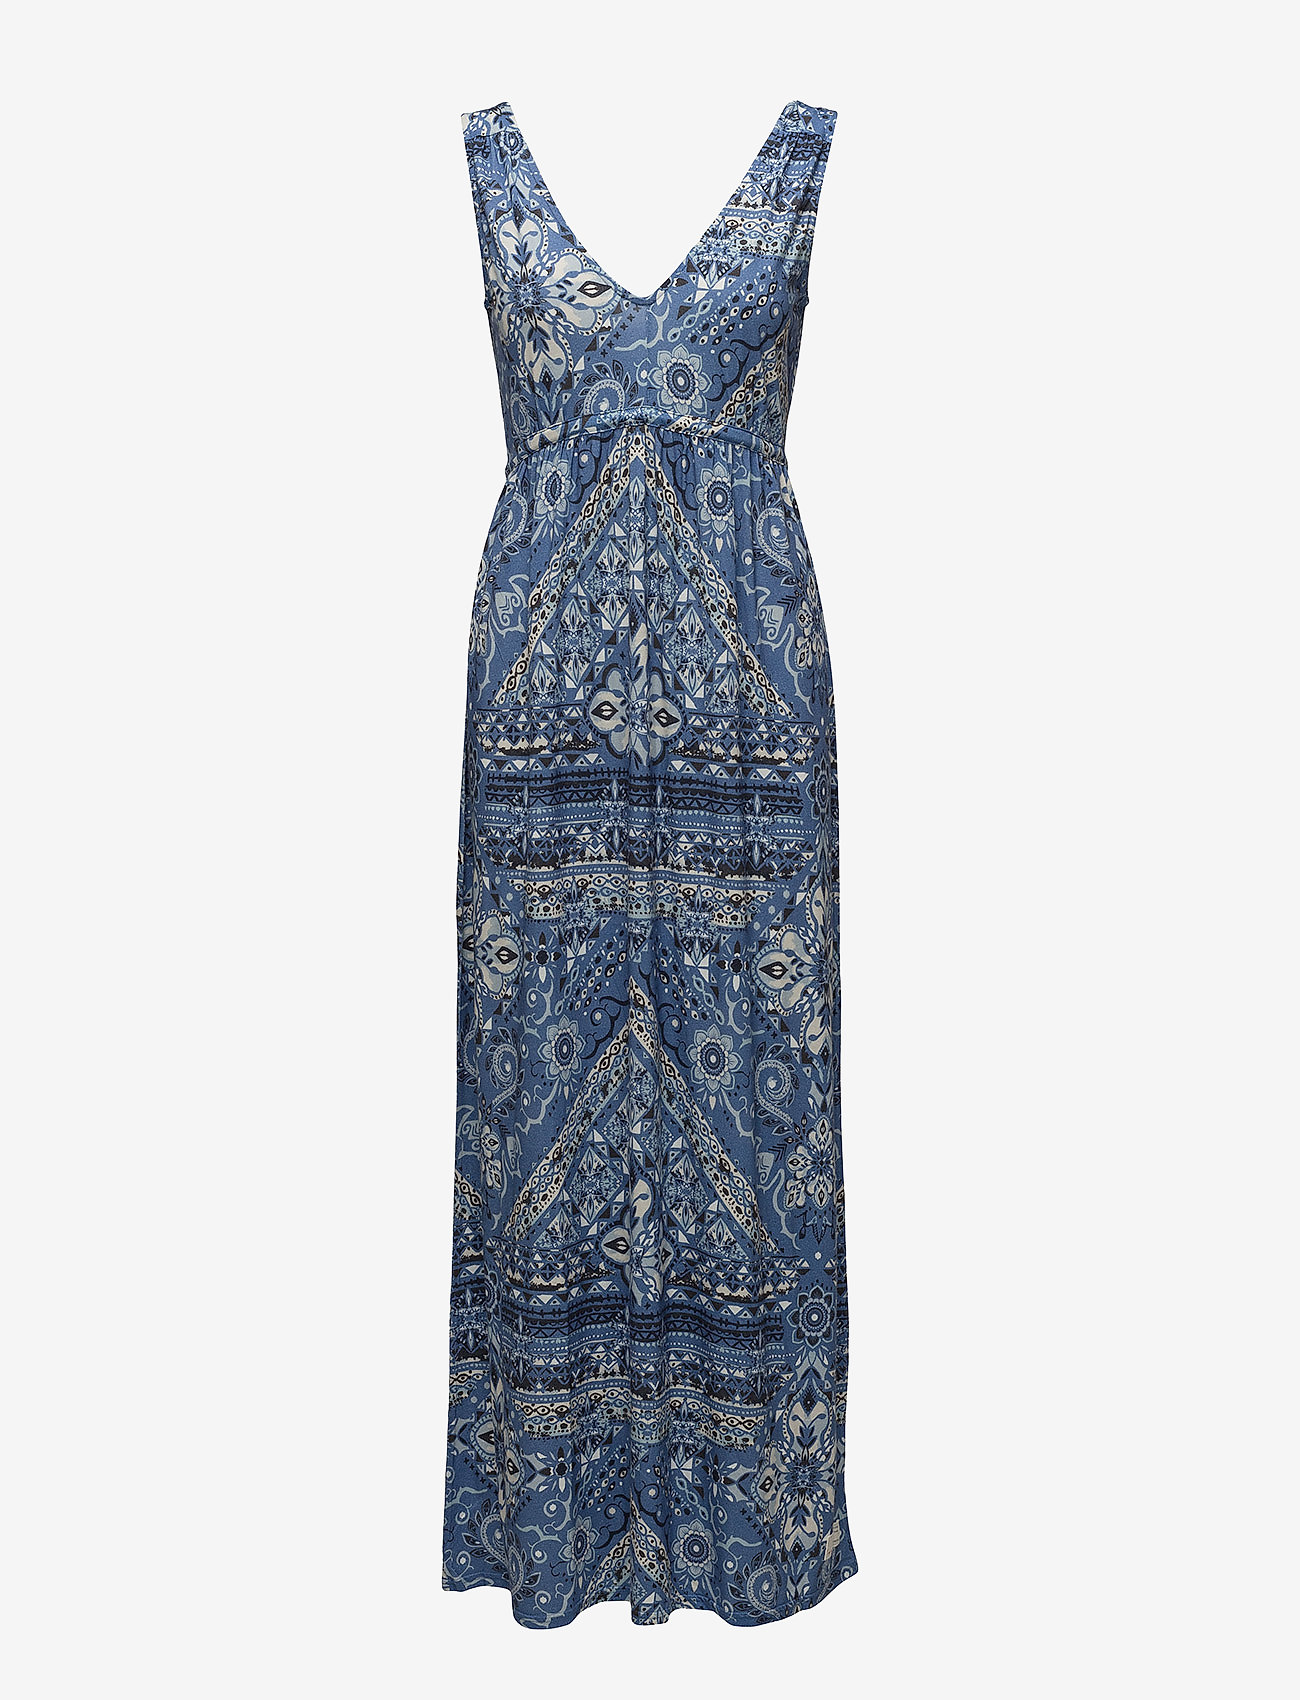 ODD MOLLY - playful long dress - robes maxi - vintage blue